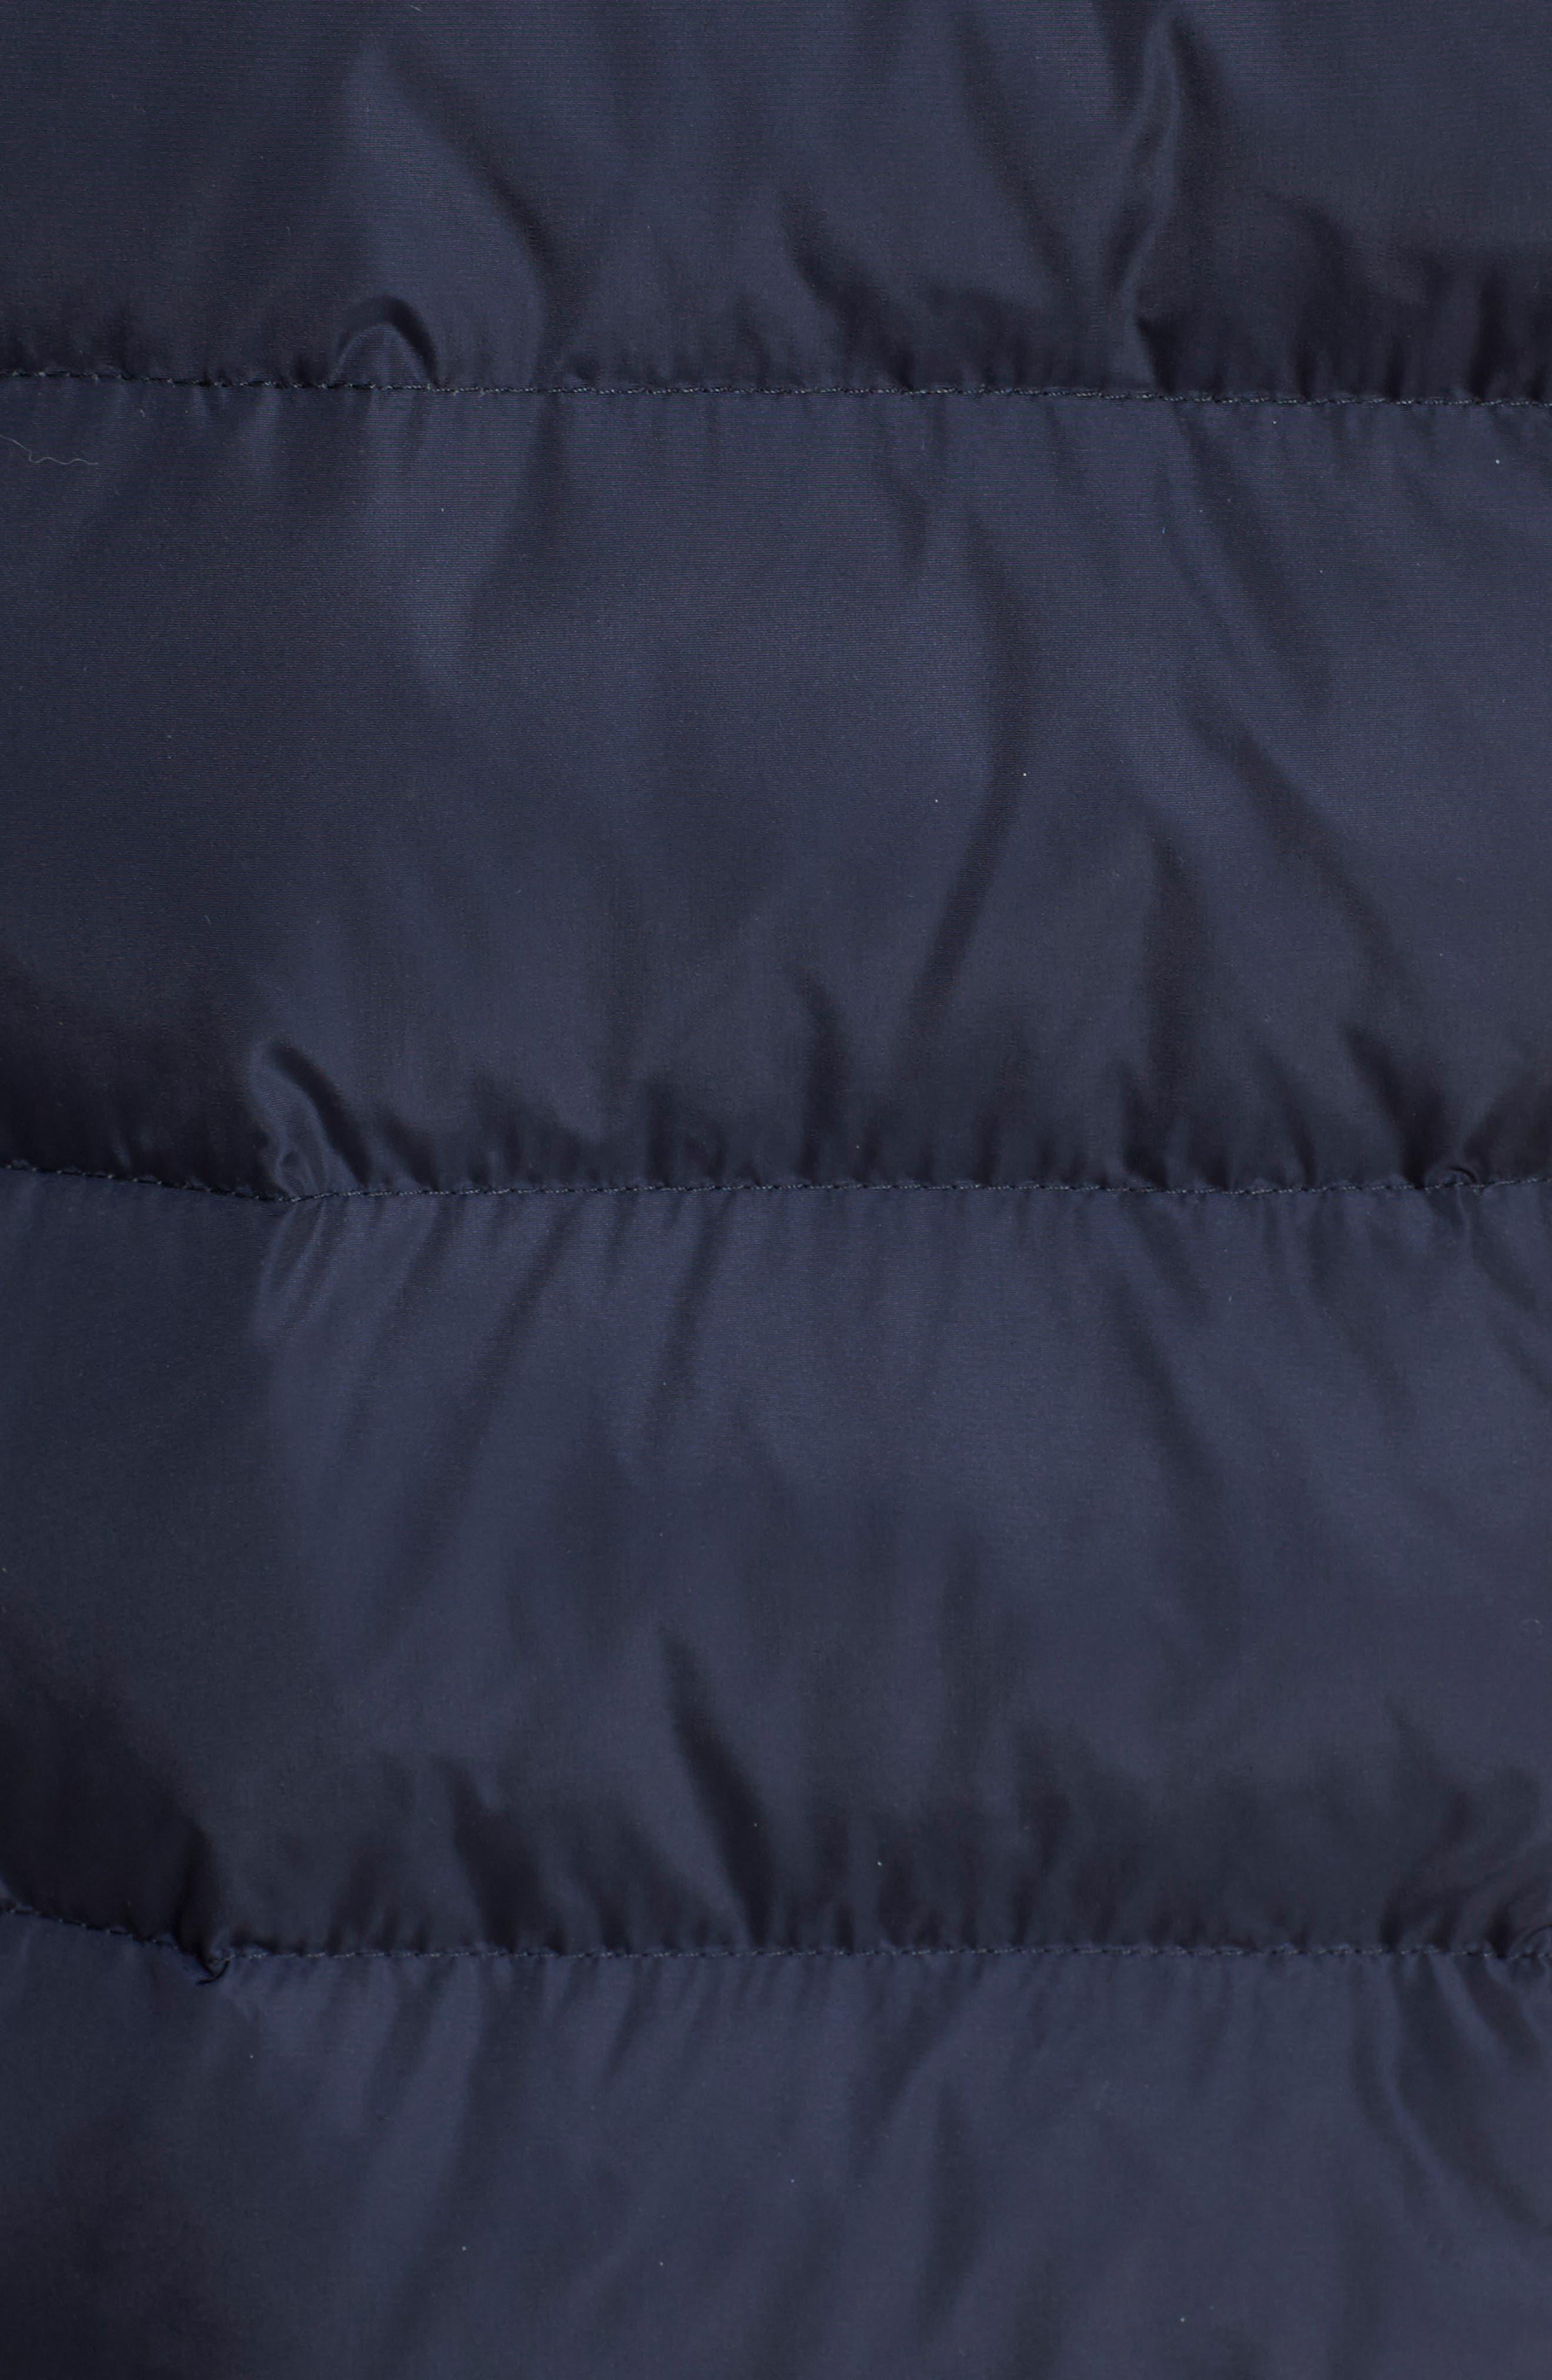 'Elestoria' Two-Piece Down Puffer Coat with Genuine Fox Fur Trim,                             Alternate thumbnail 7, color,                             419